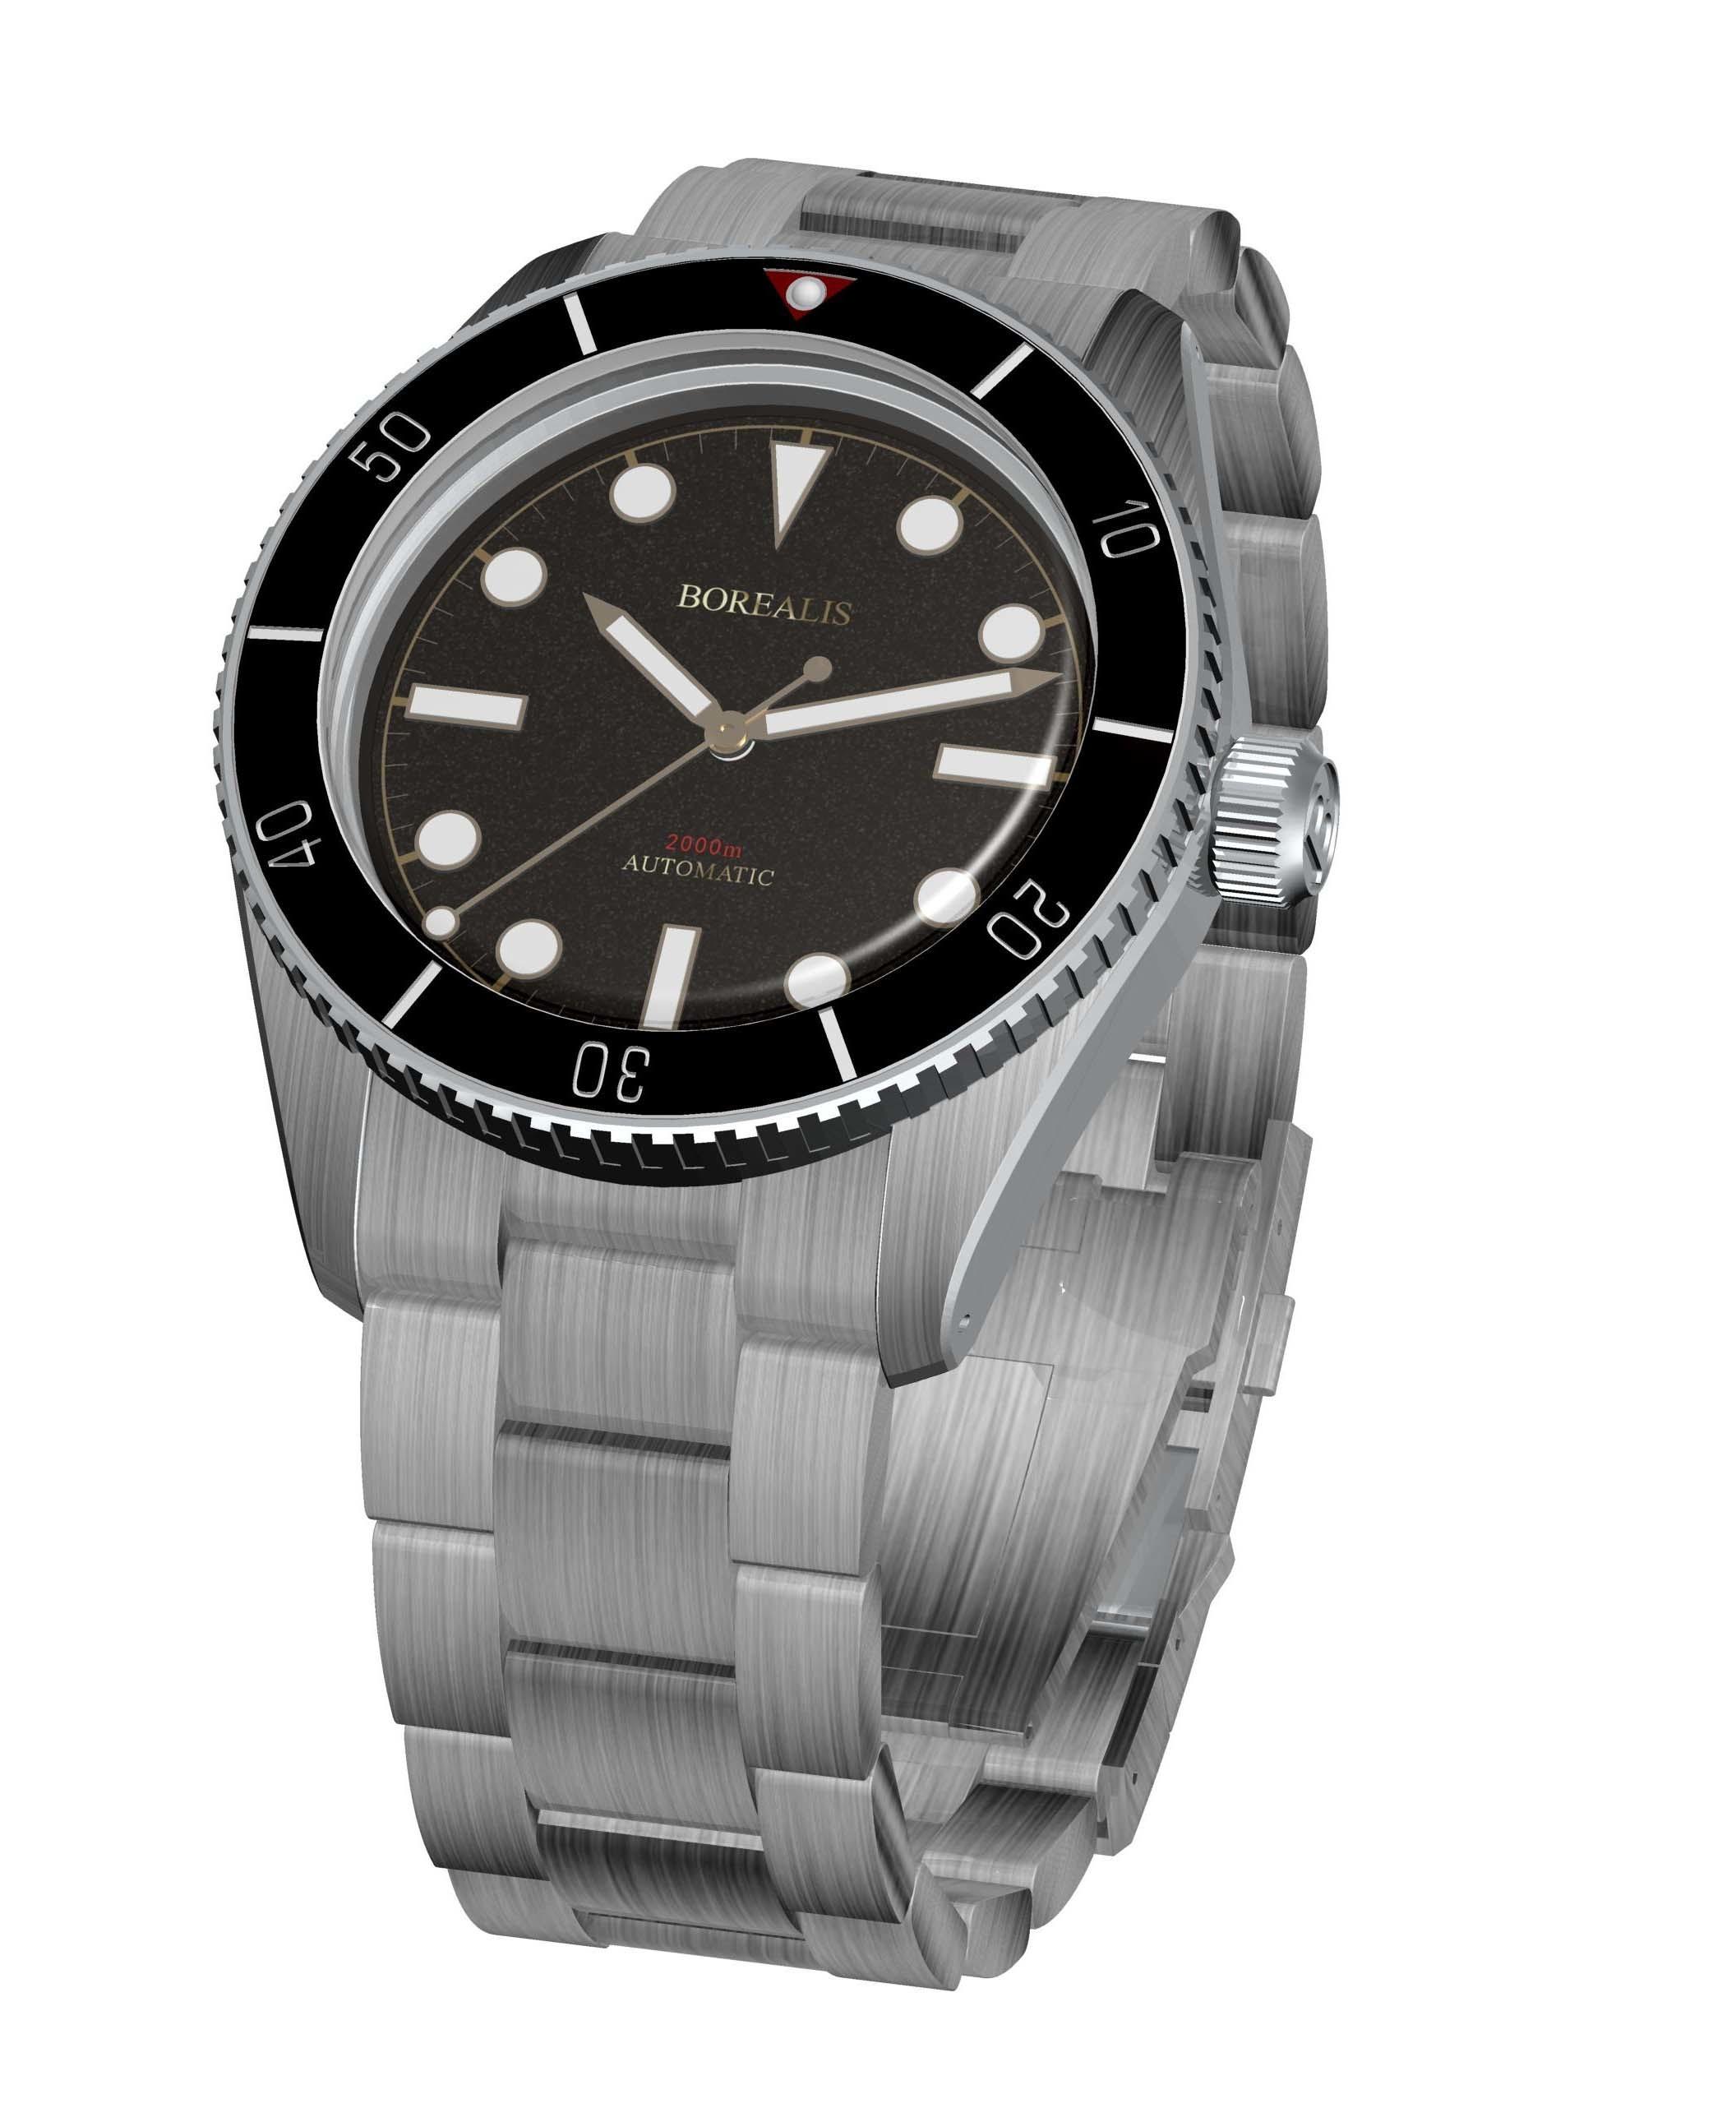 Borealis Bull Shark Automatic Diver Watch No Date Miyota 9015 Ceramic Black Bezel Black Dial